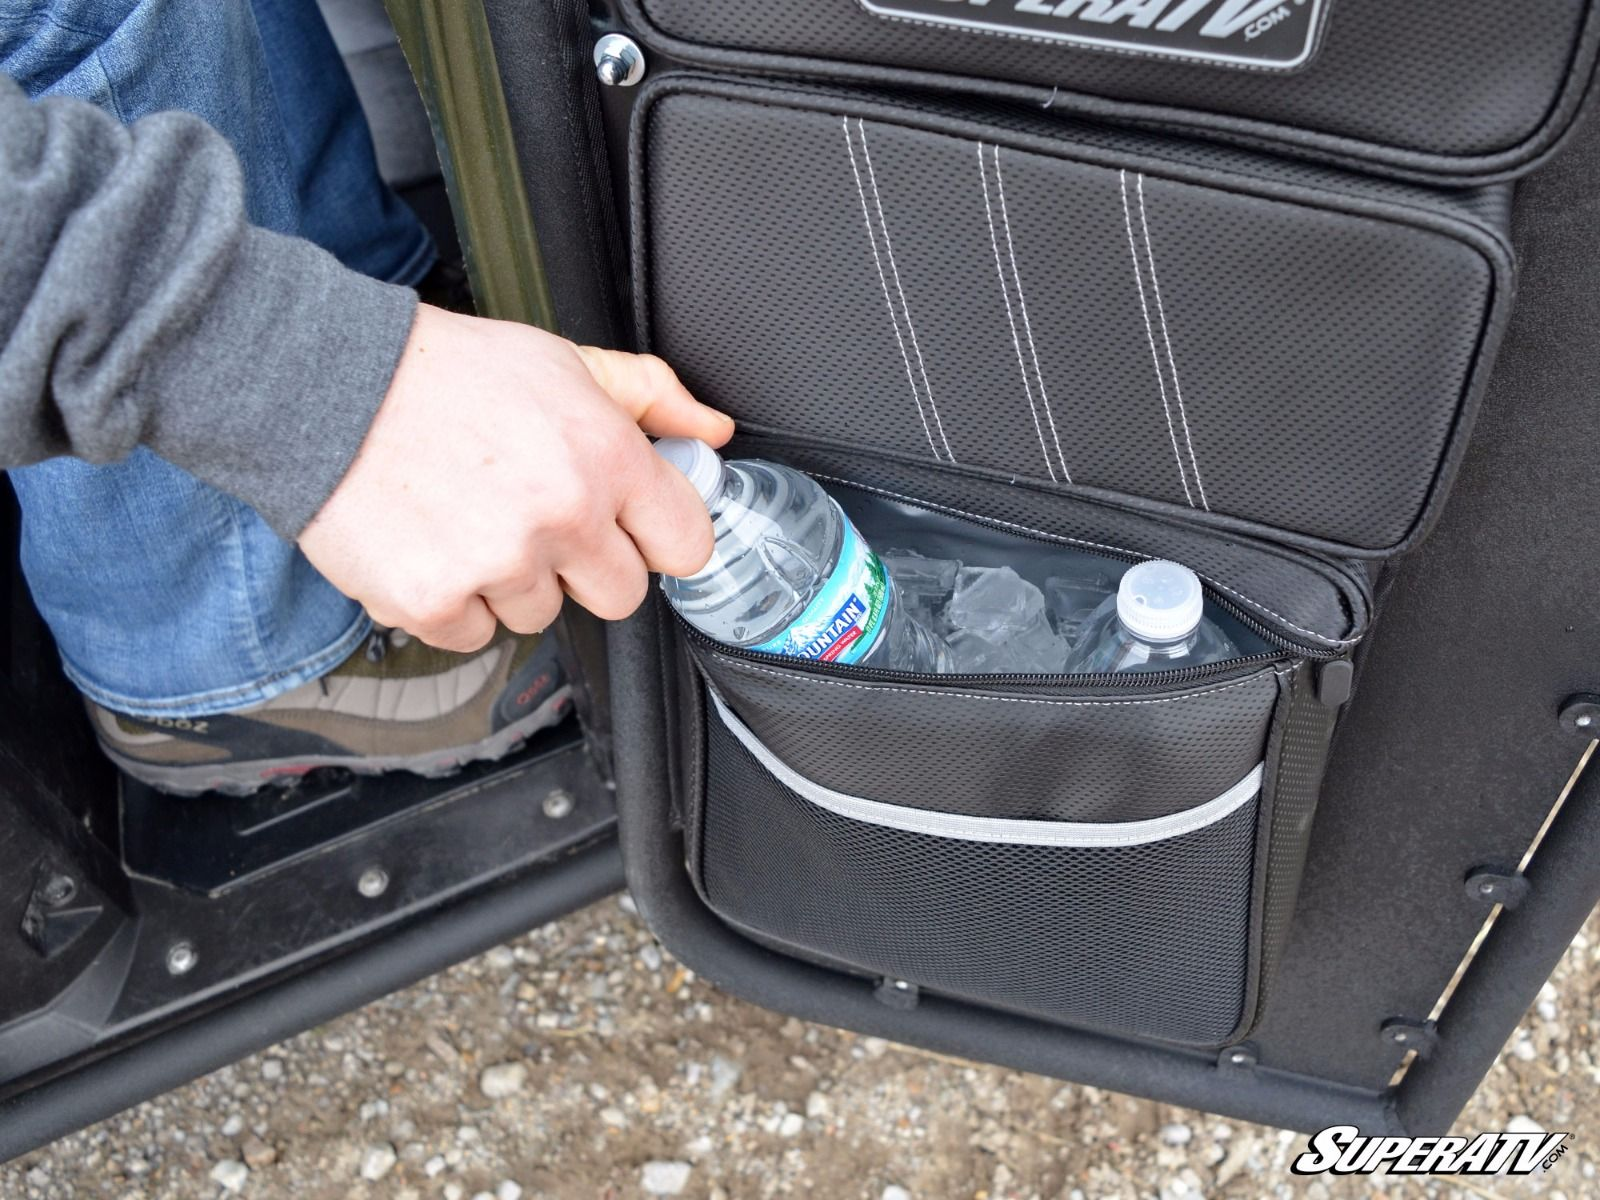 Ranger Fullsize Door Bags & Super ATV Fullsize Door Bags for Polaris Ranger